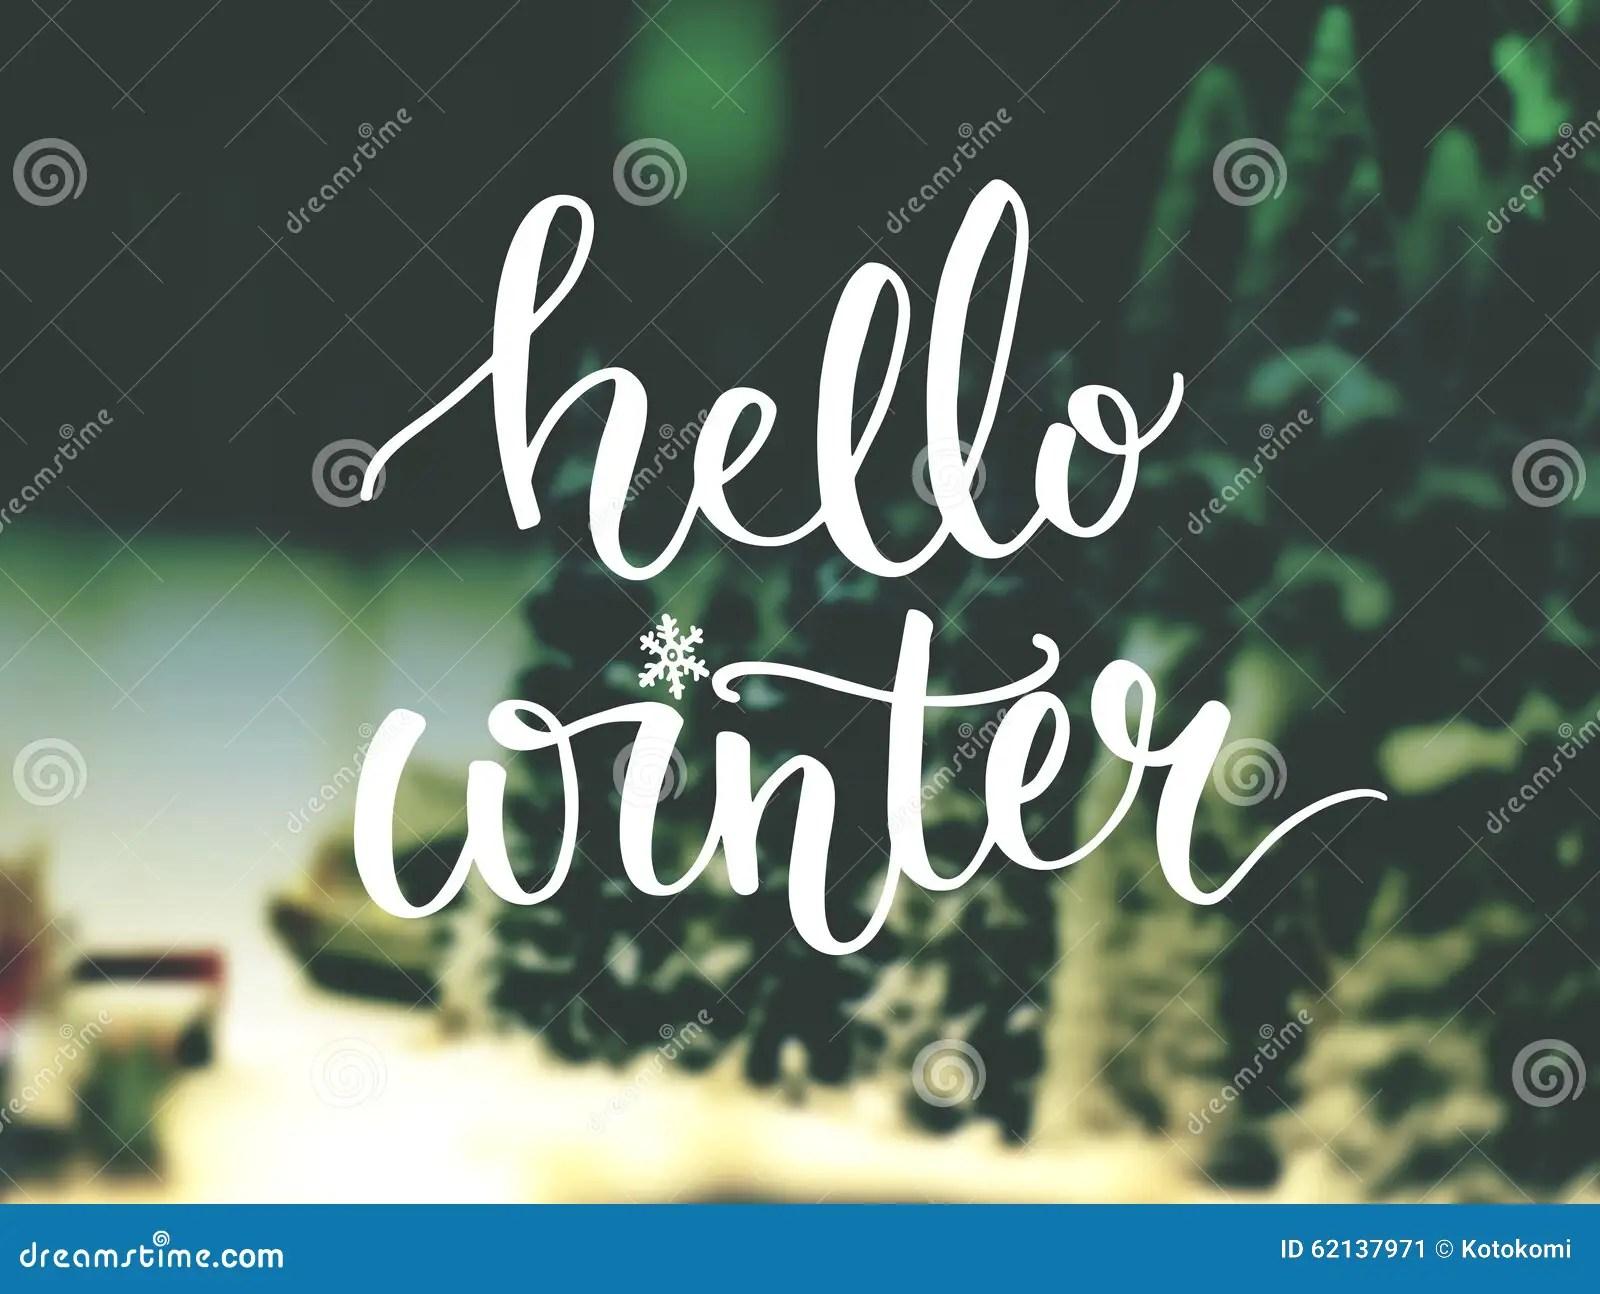 Hello Winter Typography Overlay On Blurred Photo Stock